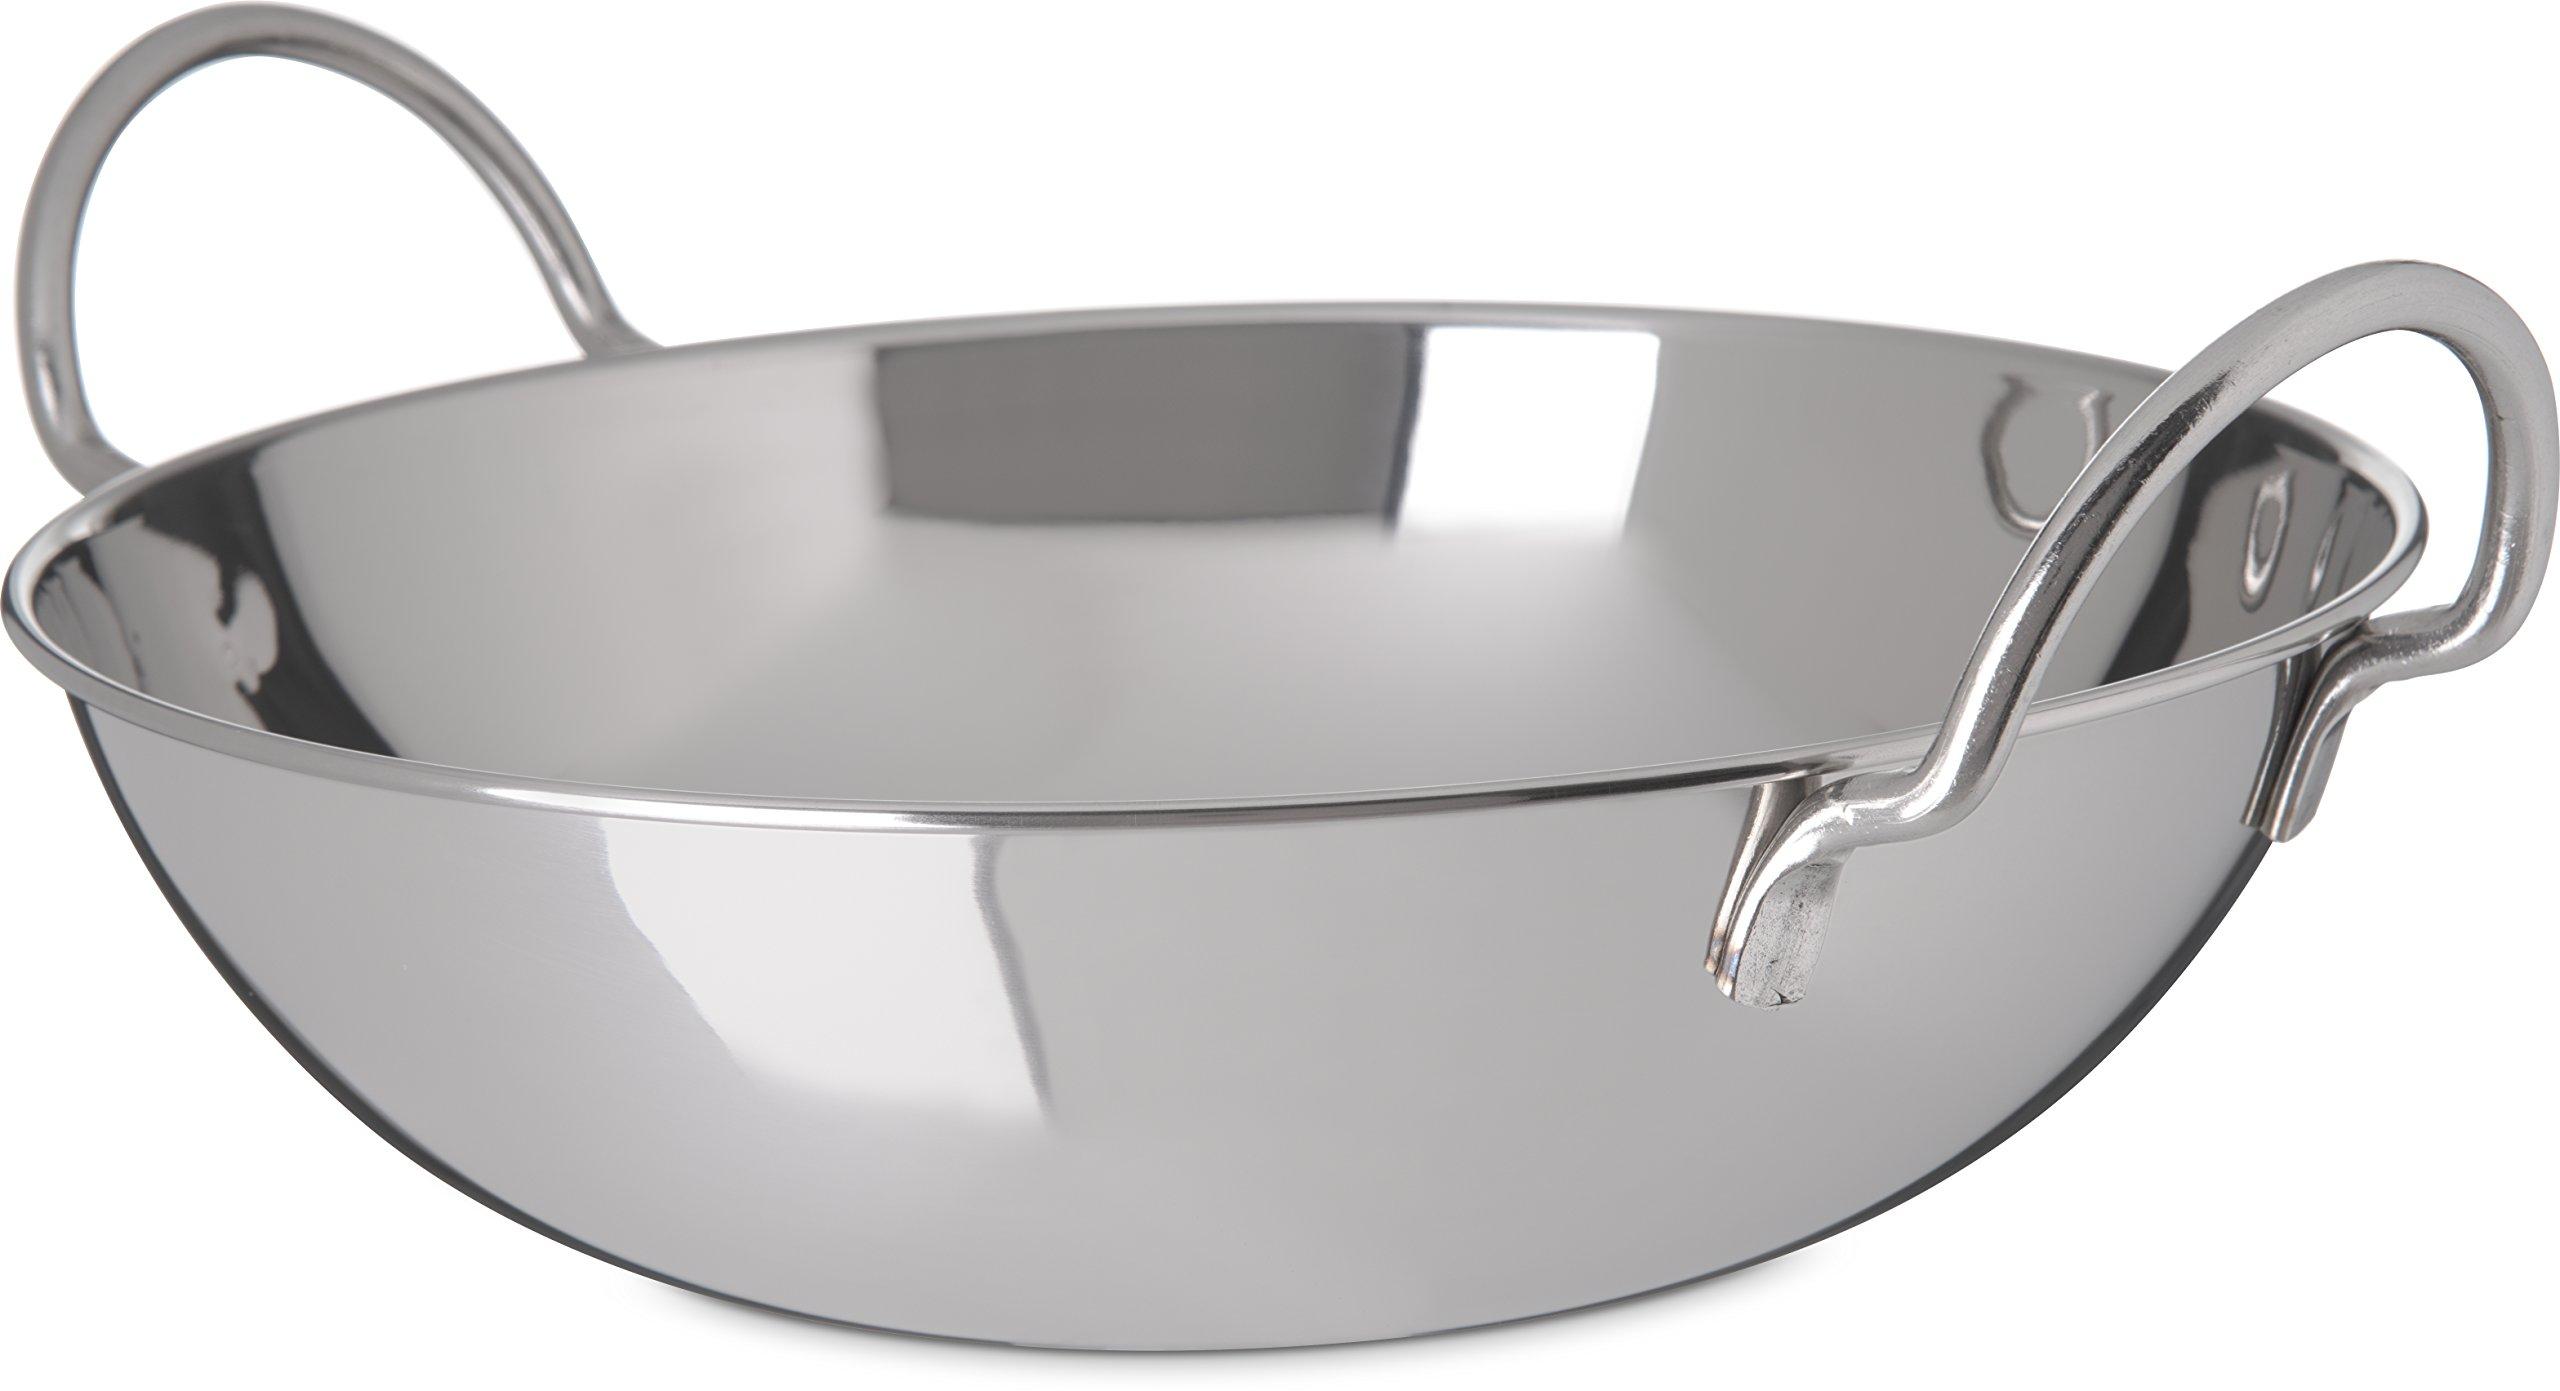 Carlisle 609097 Stainless Steel Balti Dish, 3 Quarts (Pack of 12)